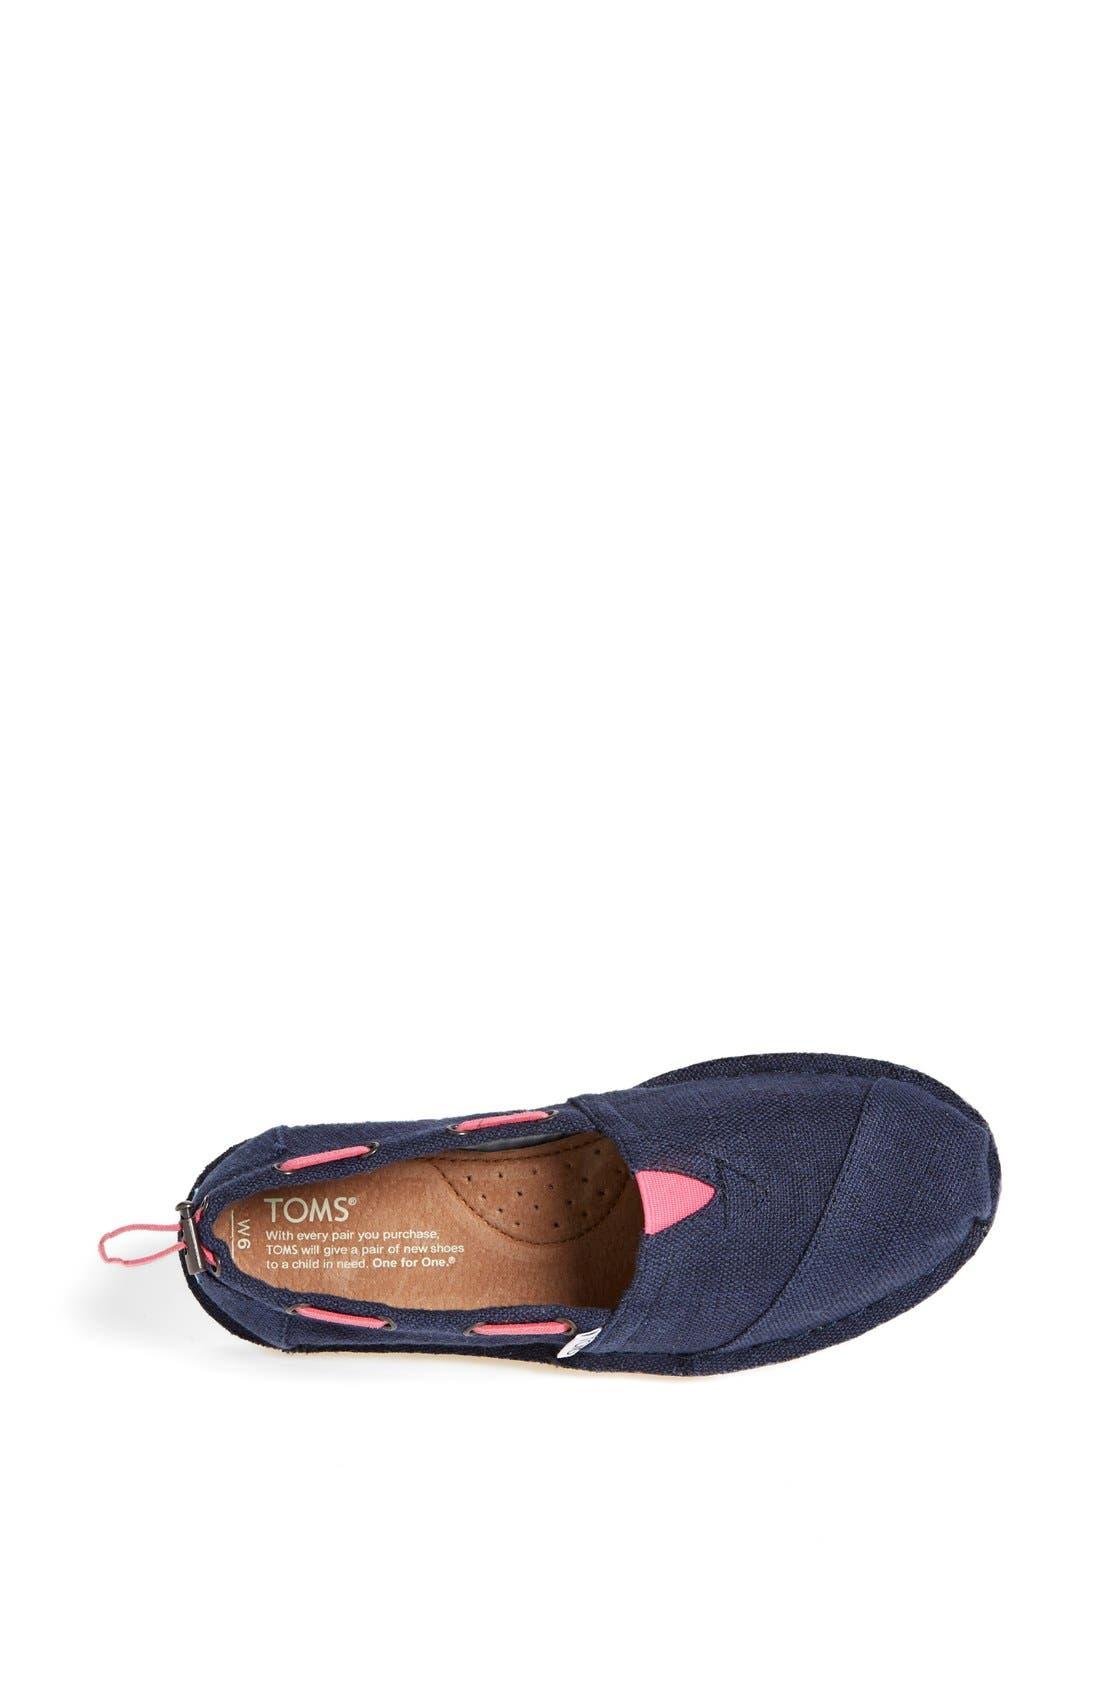 Alternate Image 3  - TOMS 'Bimini - Stitchout' Slip-On (Women)